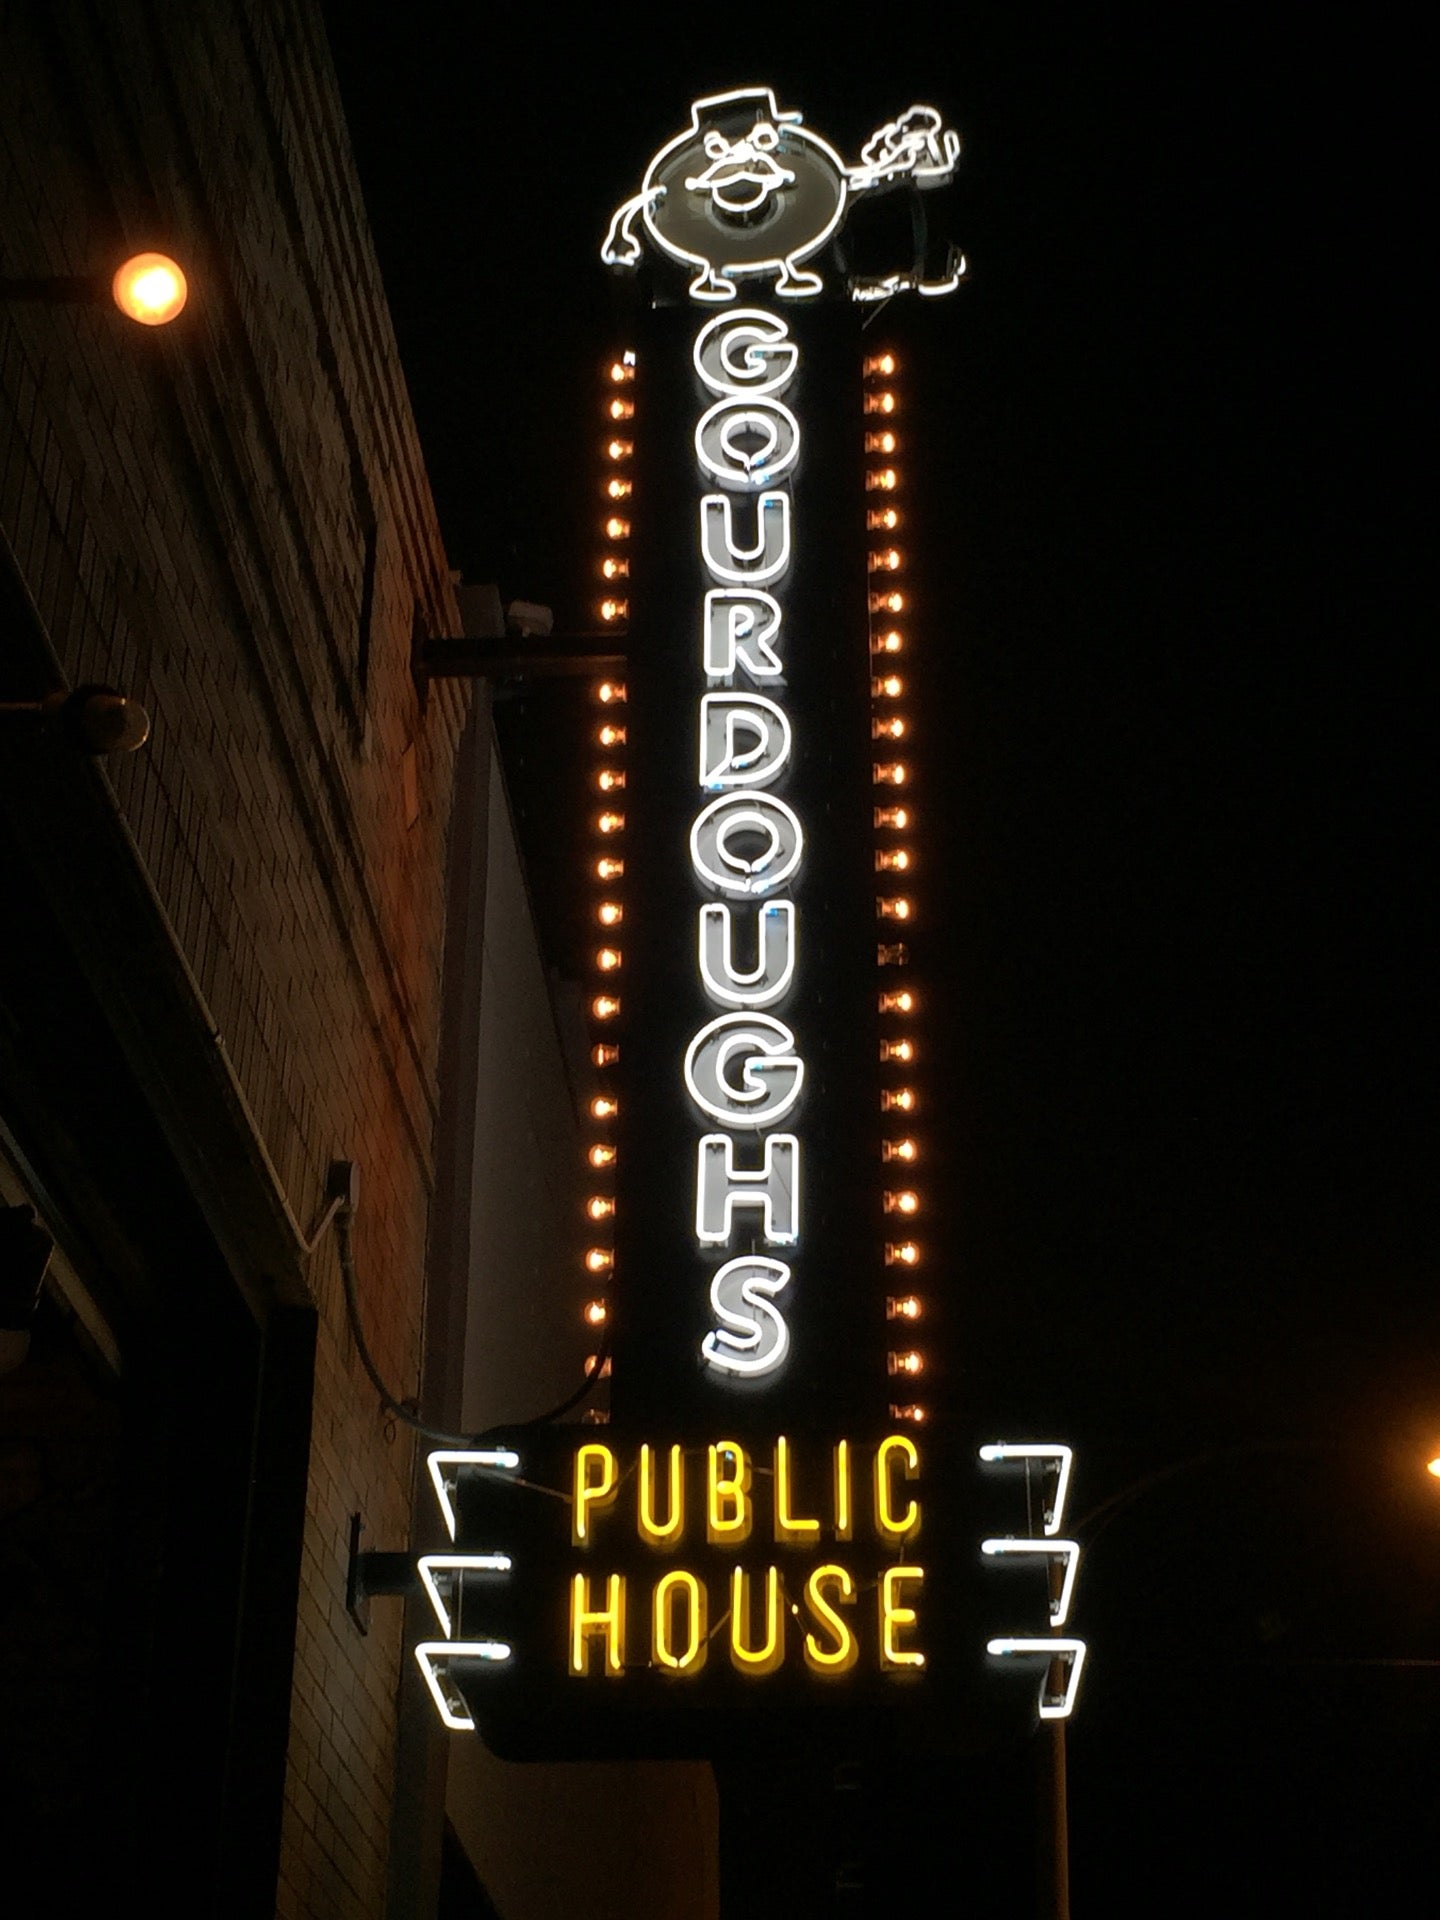 Gourdoughs Public House at W 5th St Ste B at Lavaca St